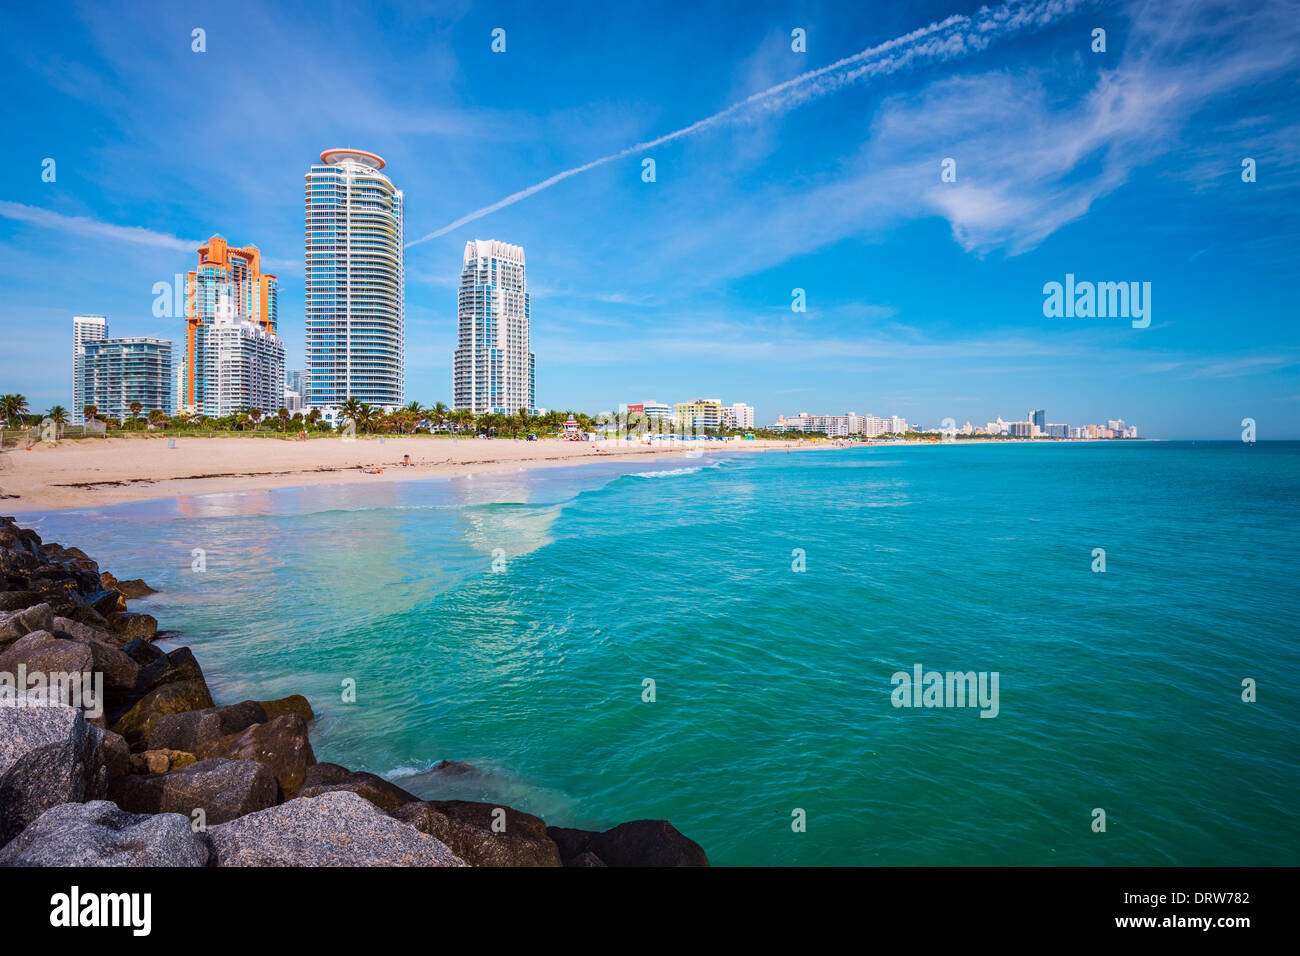 Miami, Florida am Südstrand. Stockbild